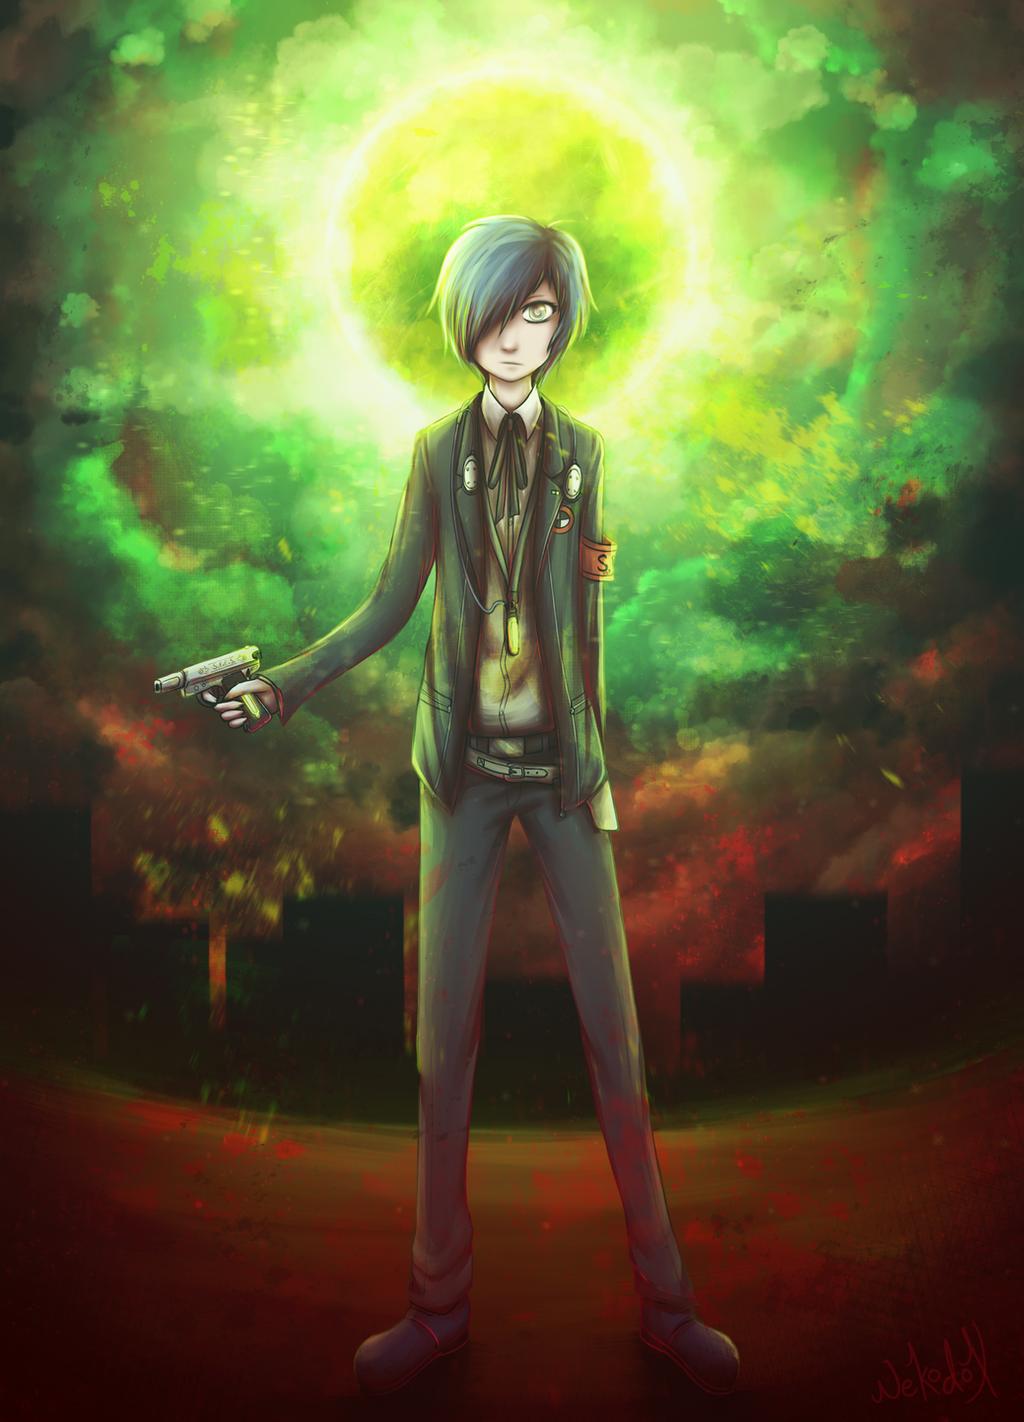 [Persona 3] Protagonist / Minato Arisato by Nekodox